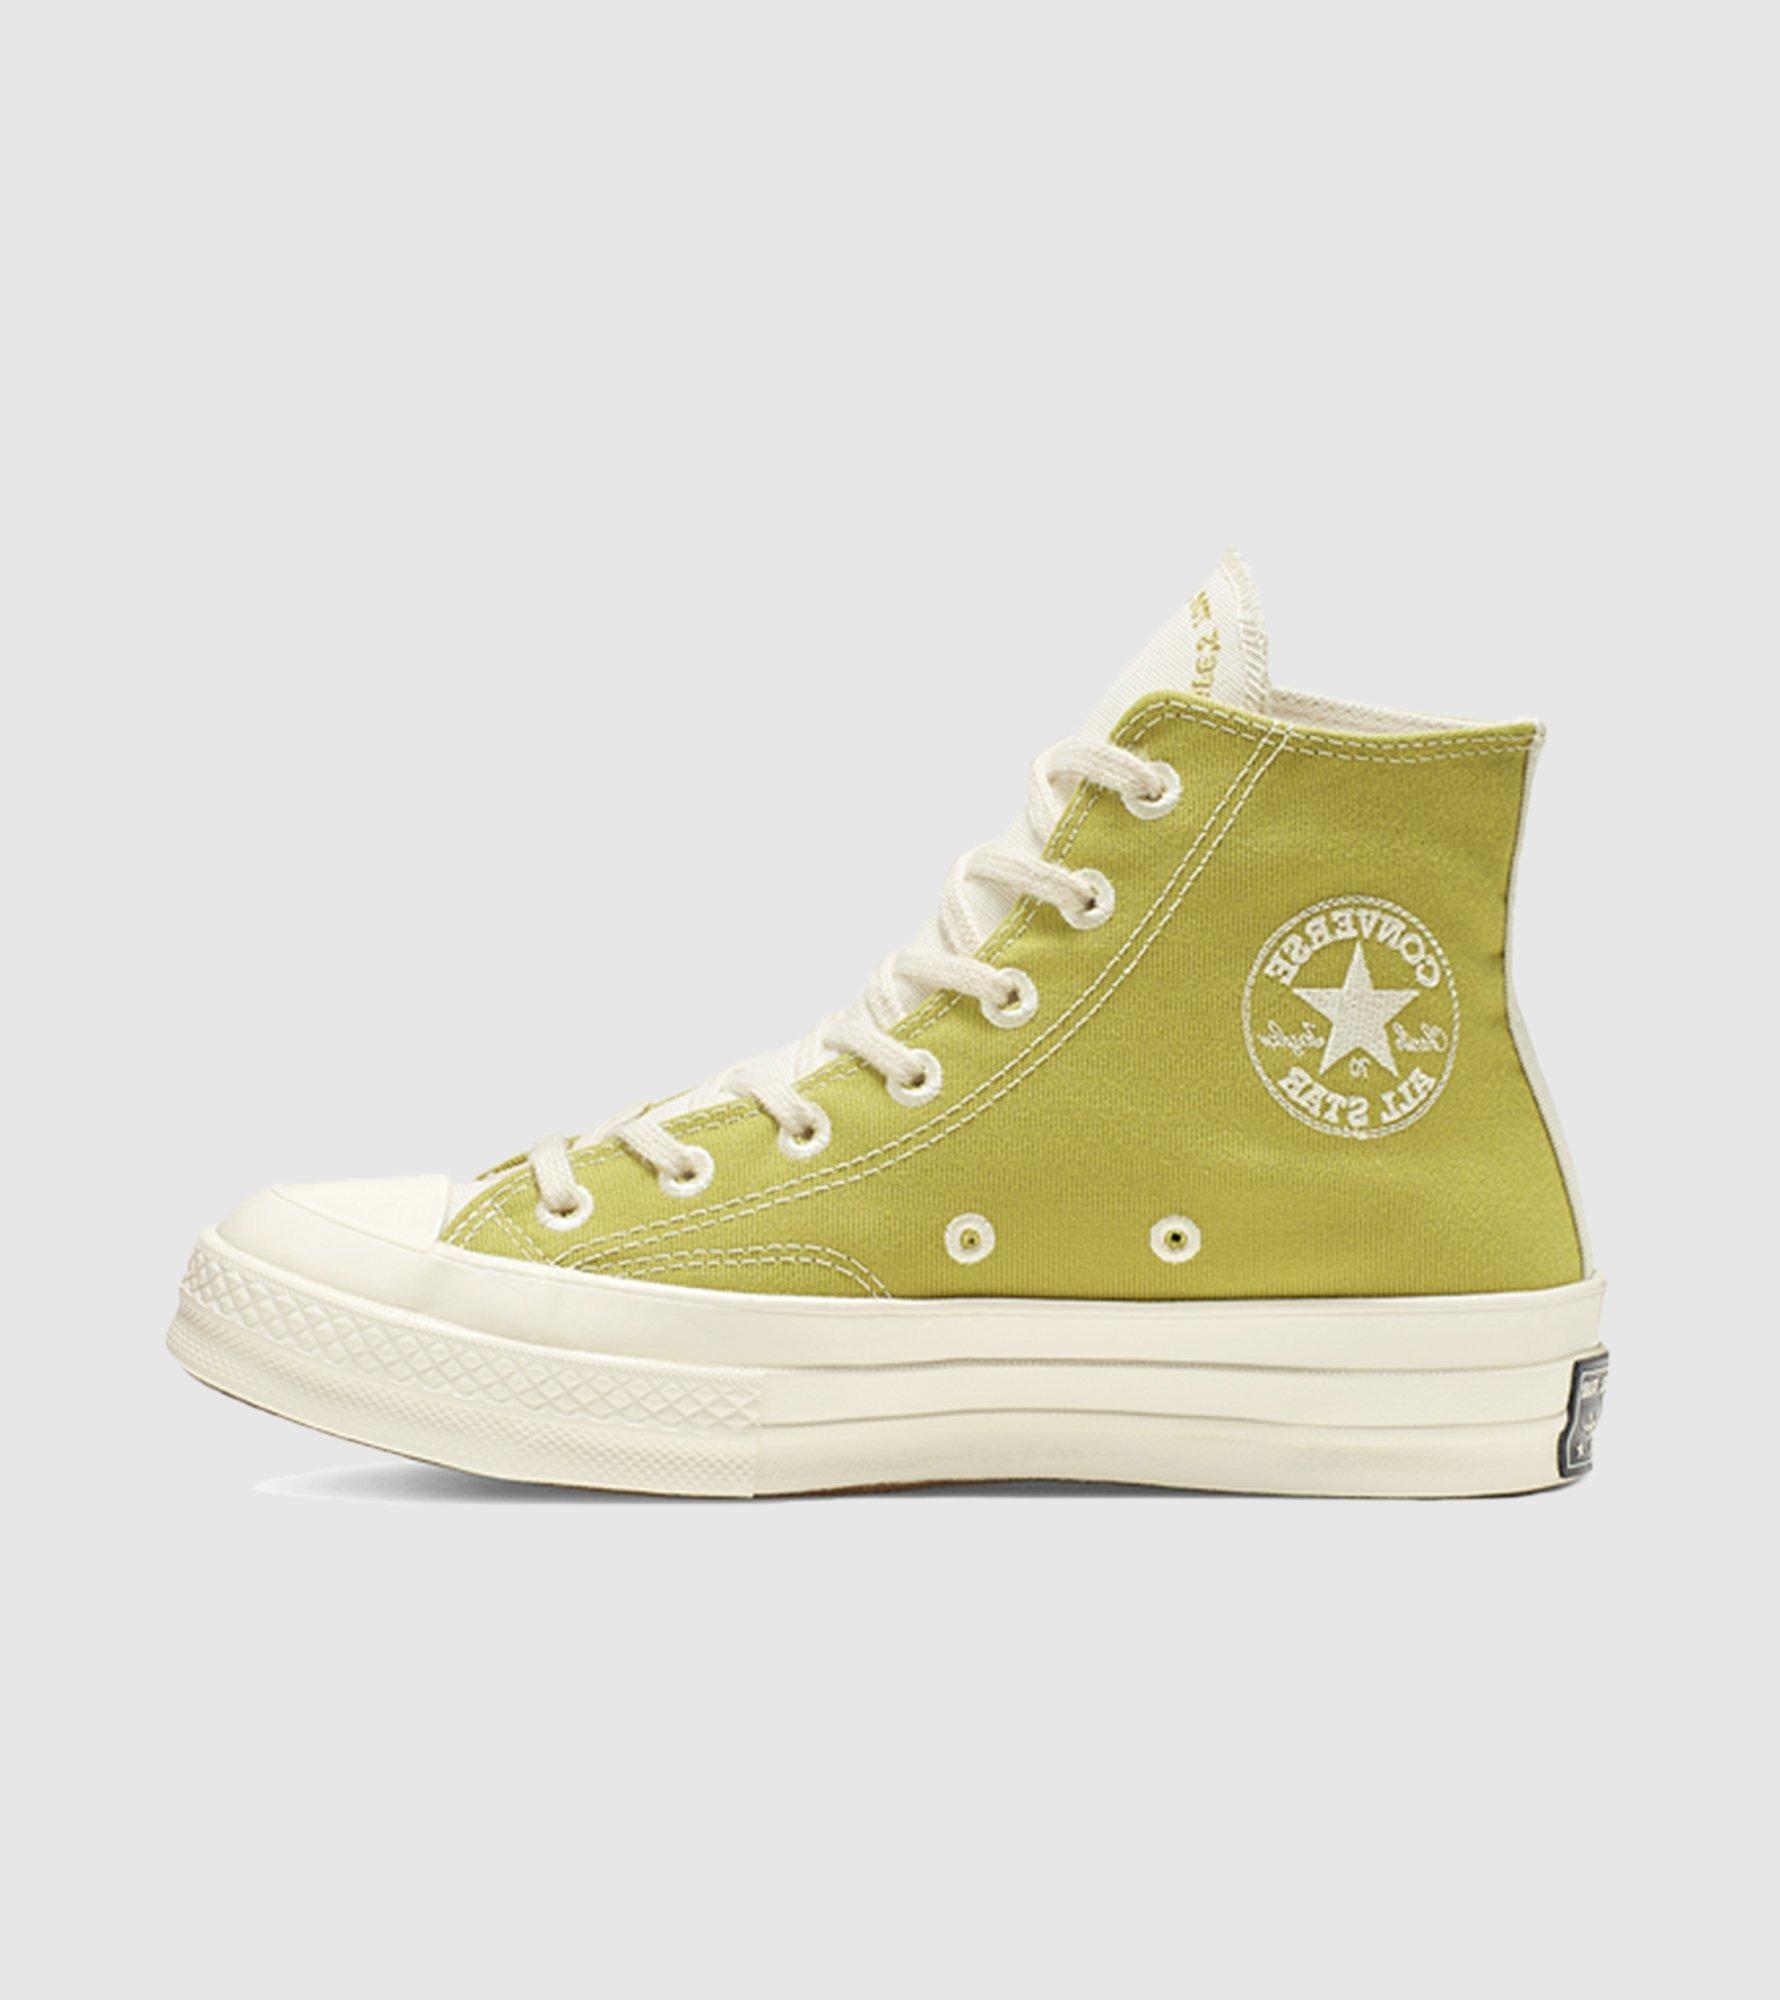 converse-chuck-taylor-all-star-70-hi-renew-womens by converse